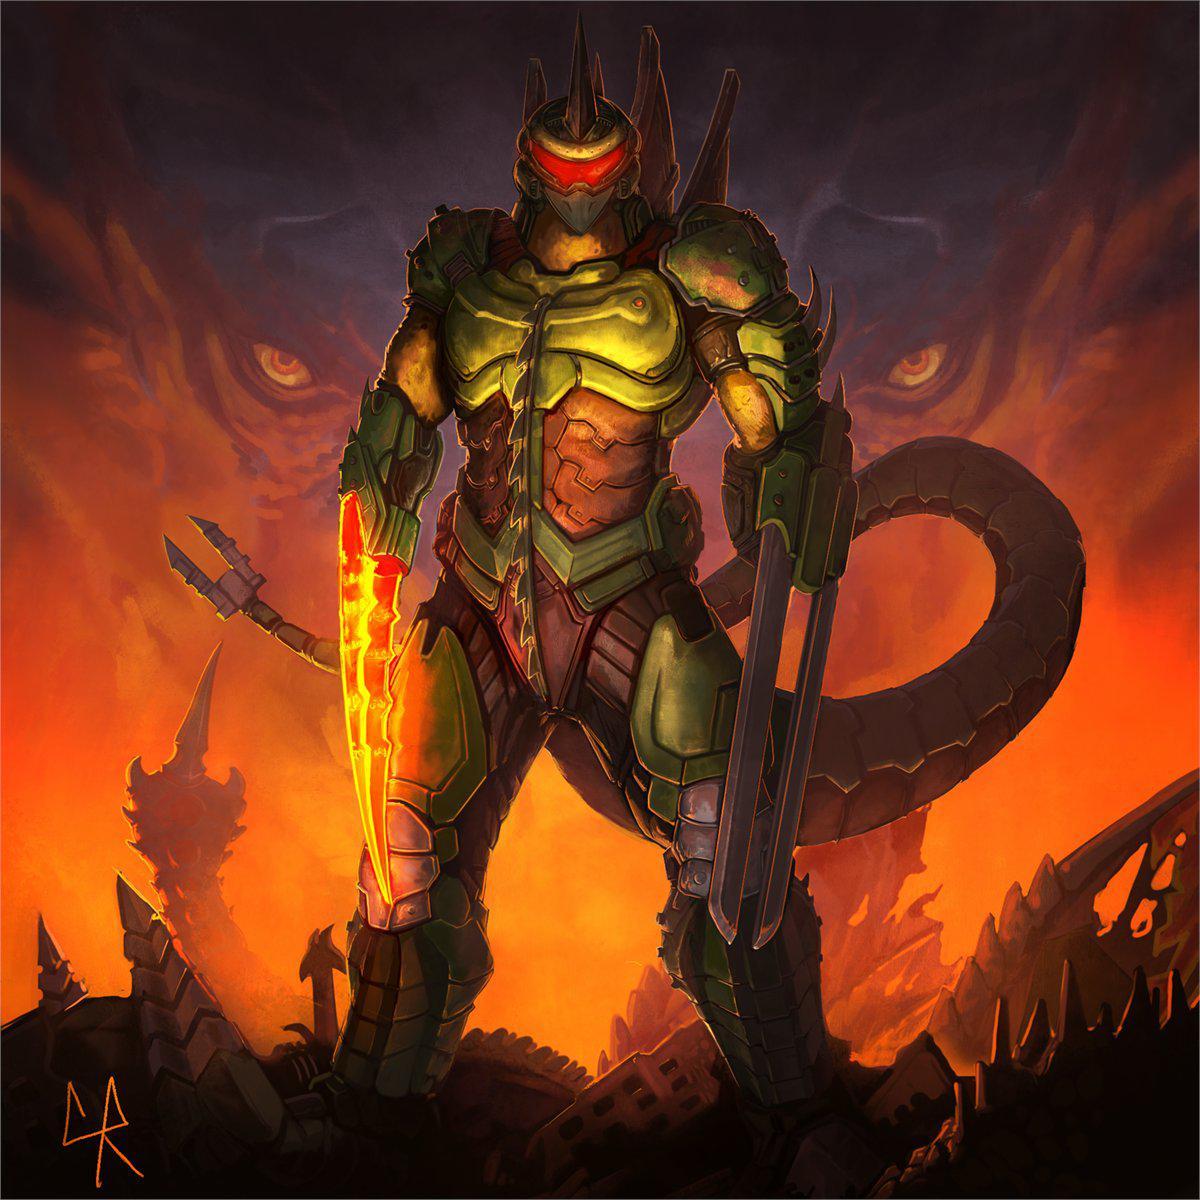 Doomslayer Plus Gigan From Godzilla Fandom